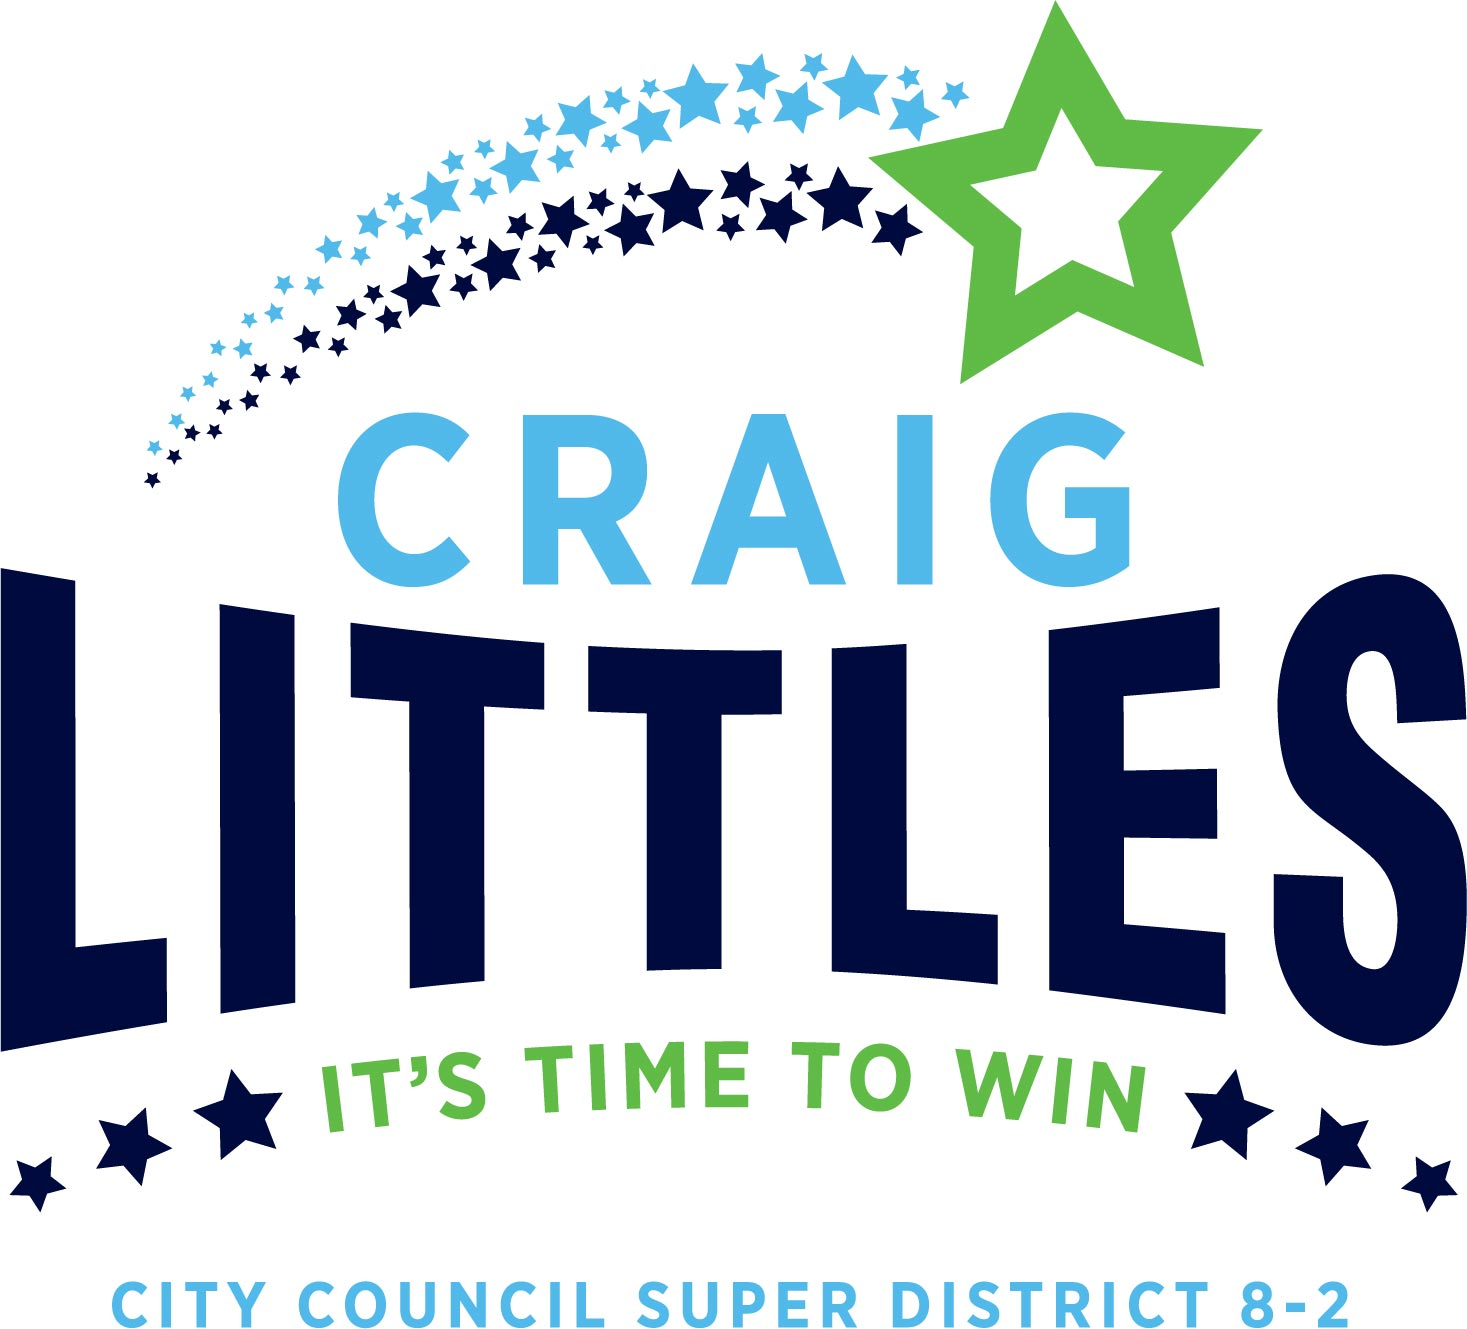 Craig Littles